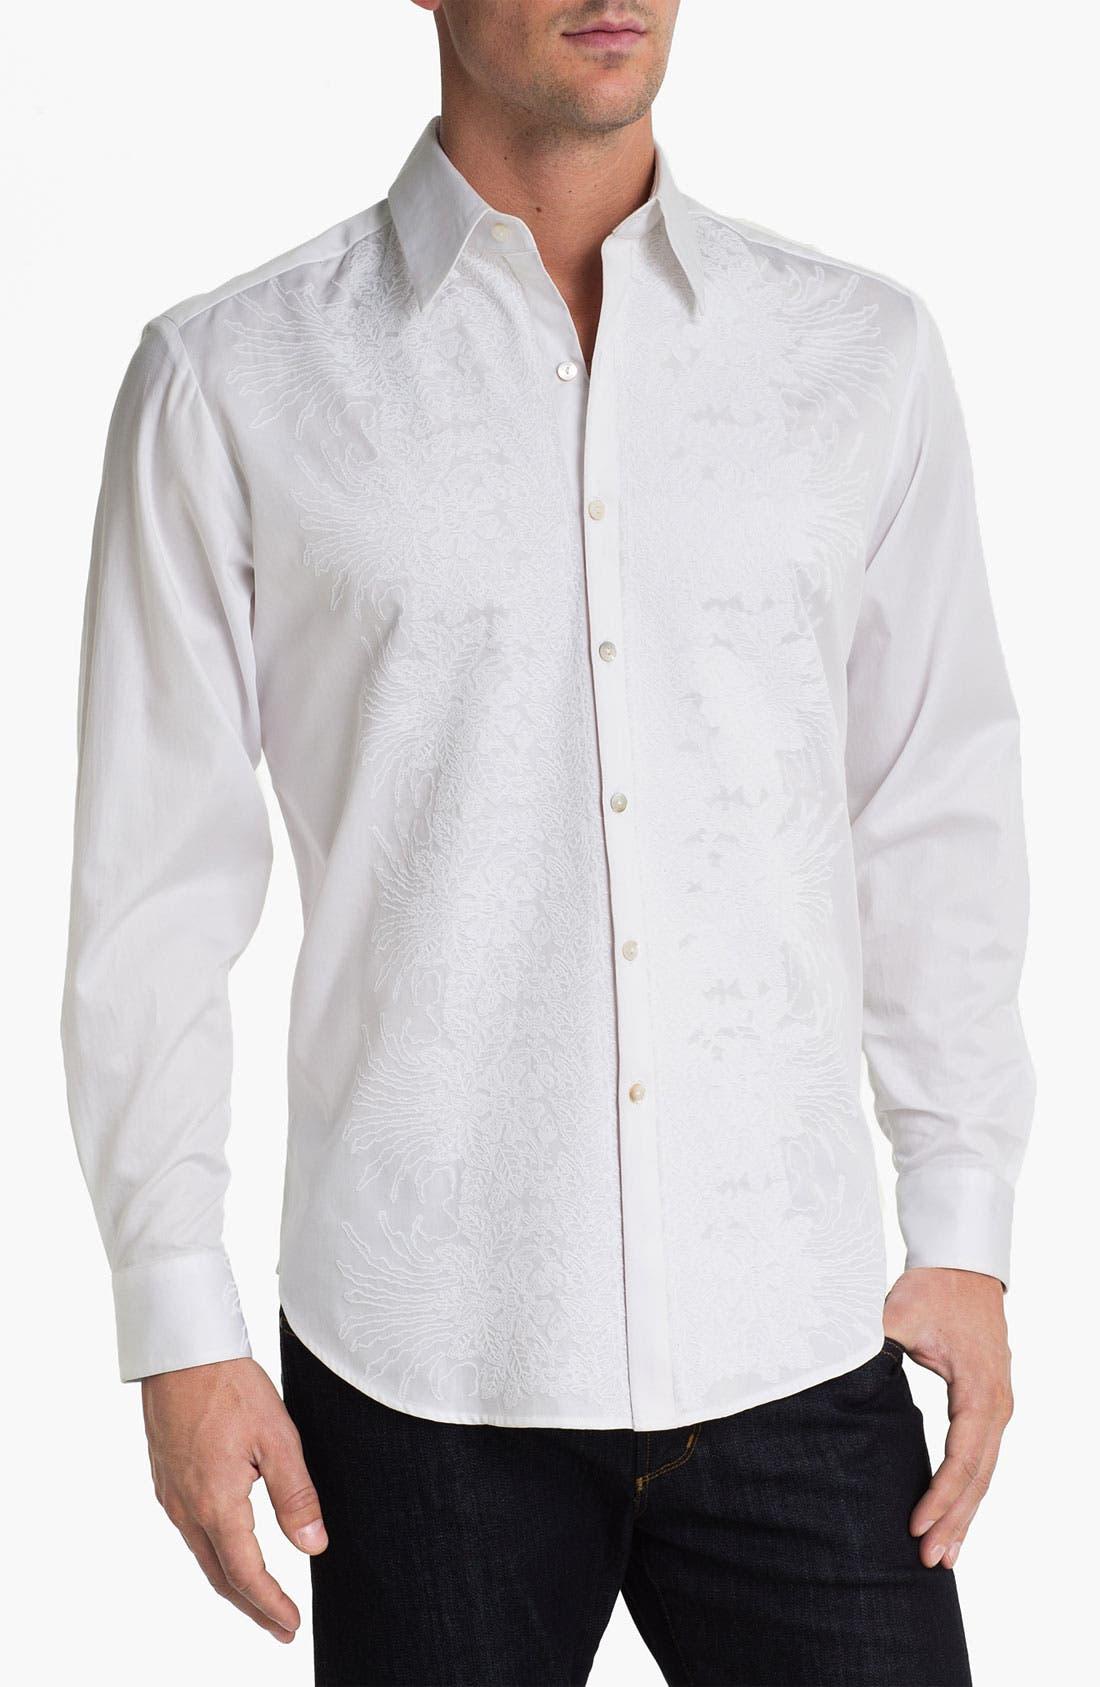 Alternate Image 1 Selected - Robert Graham 'Cross Jack' Sport Shirt